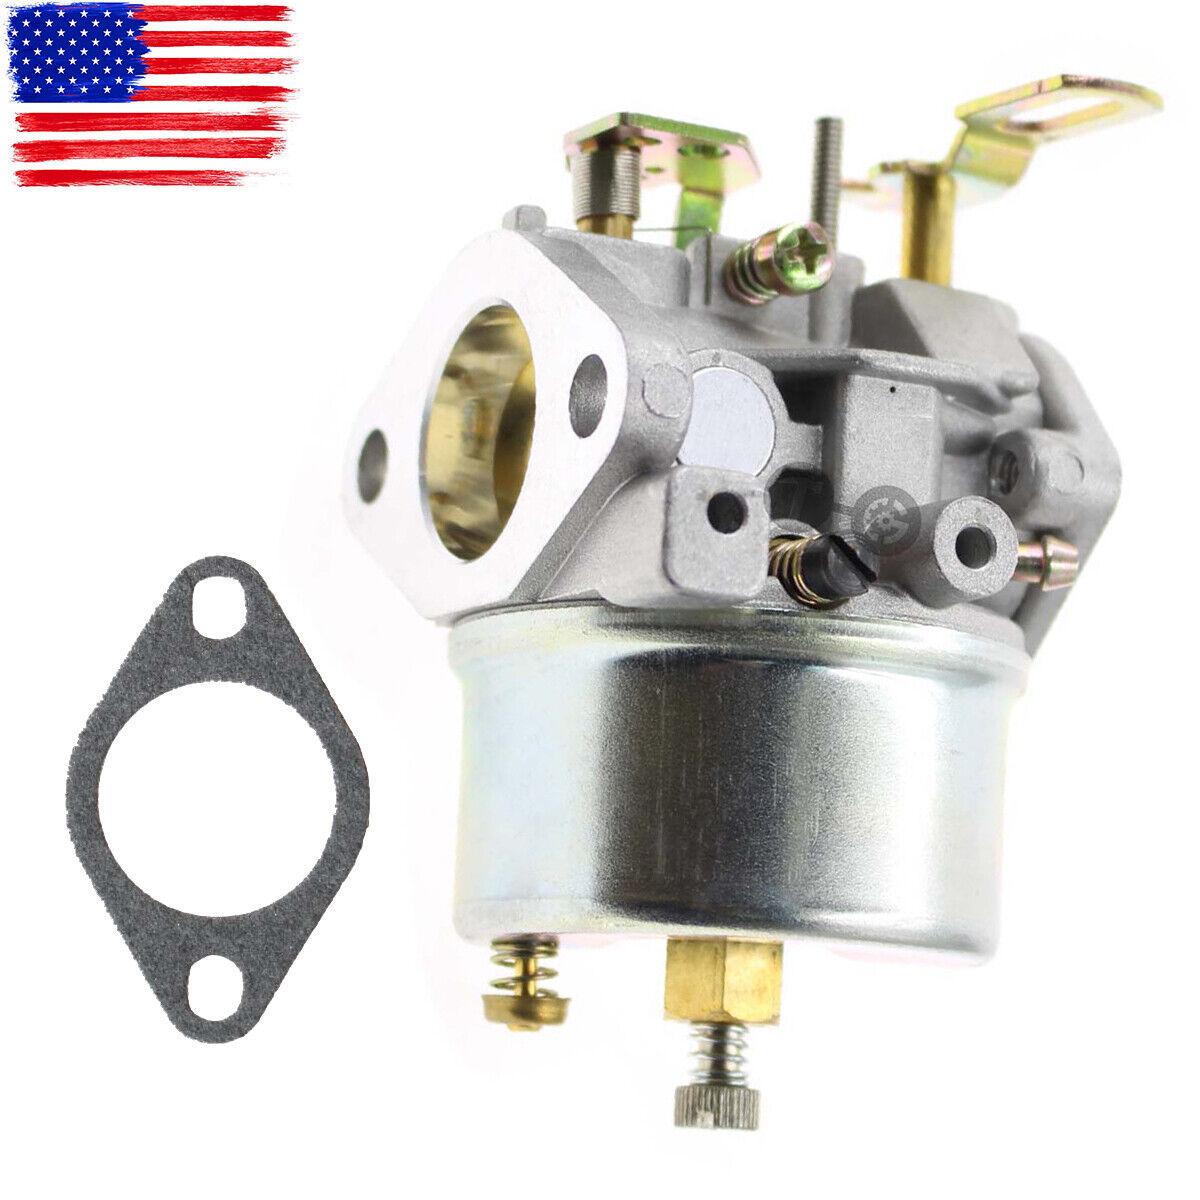 Details about Adjustable Carburetor for Tecumseh 7hp 8hp Toro Sears  Craftsman MTD Snowblowers